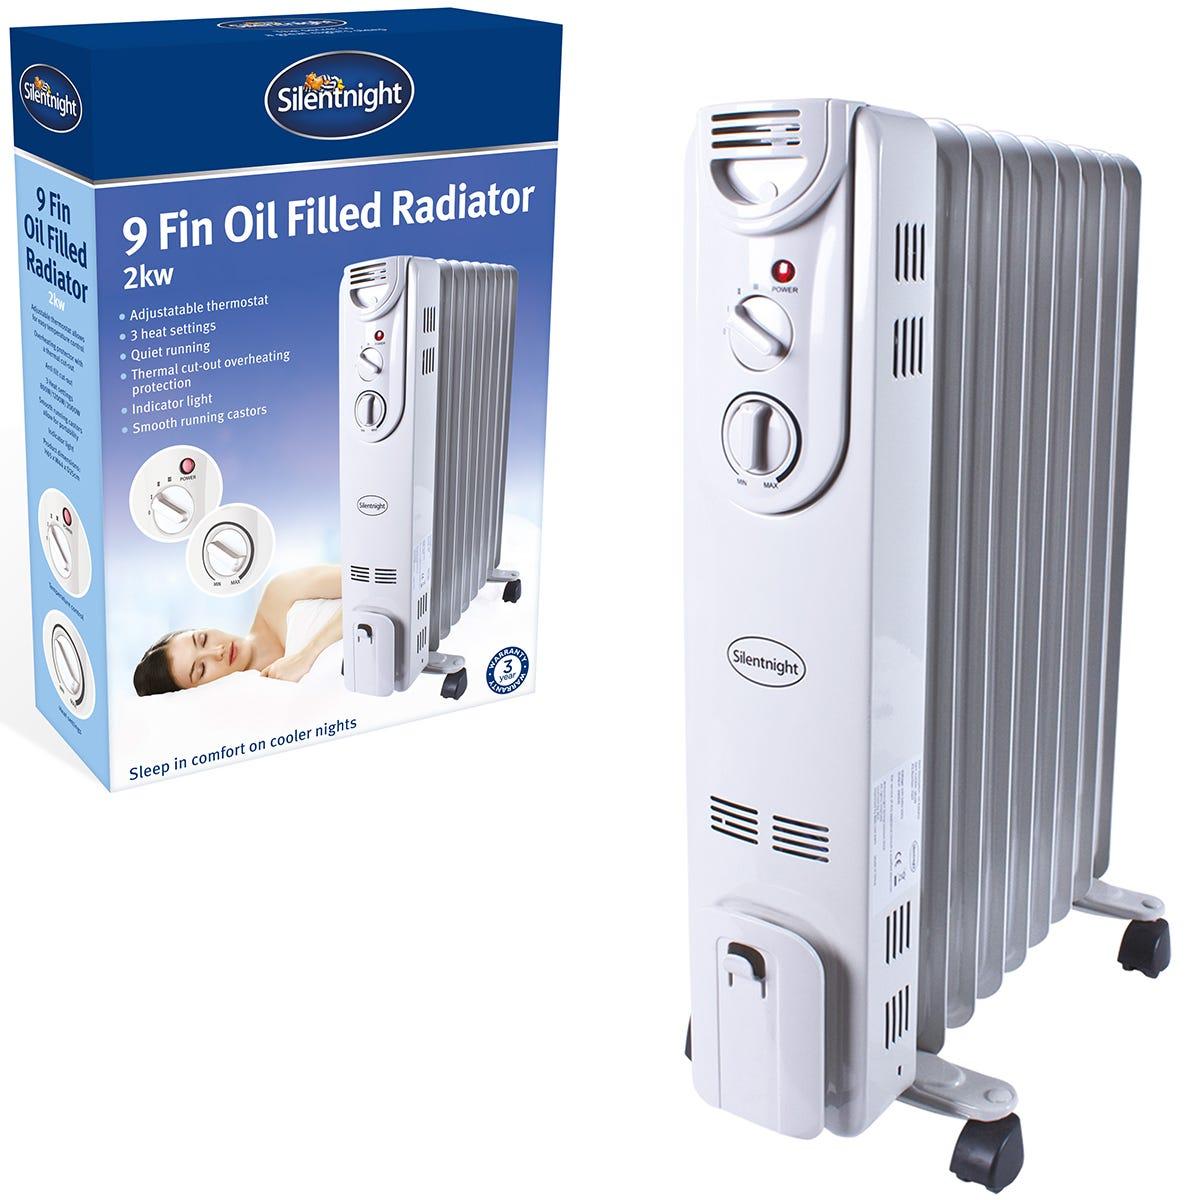 SilentNight 9Fin Oil Radiator